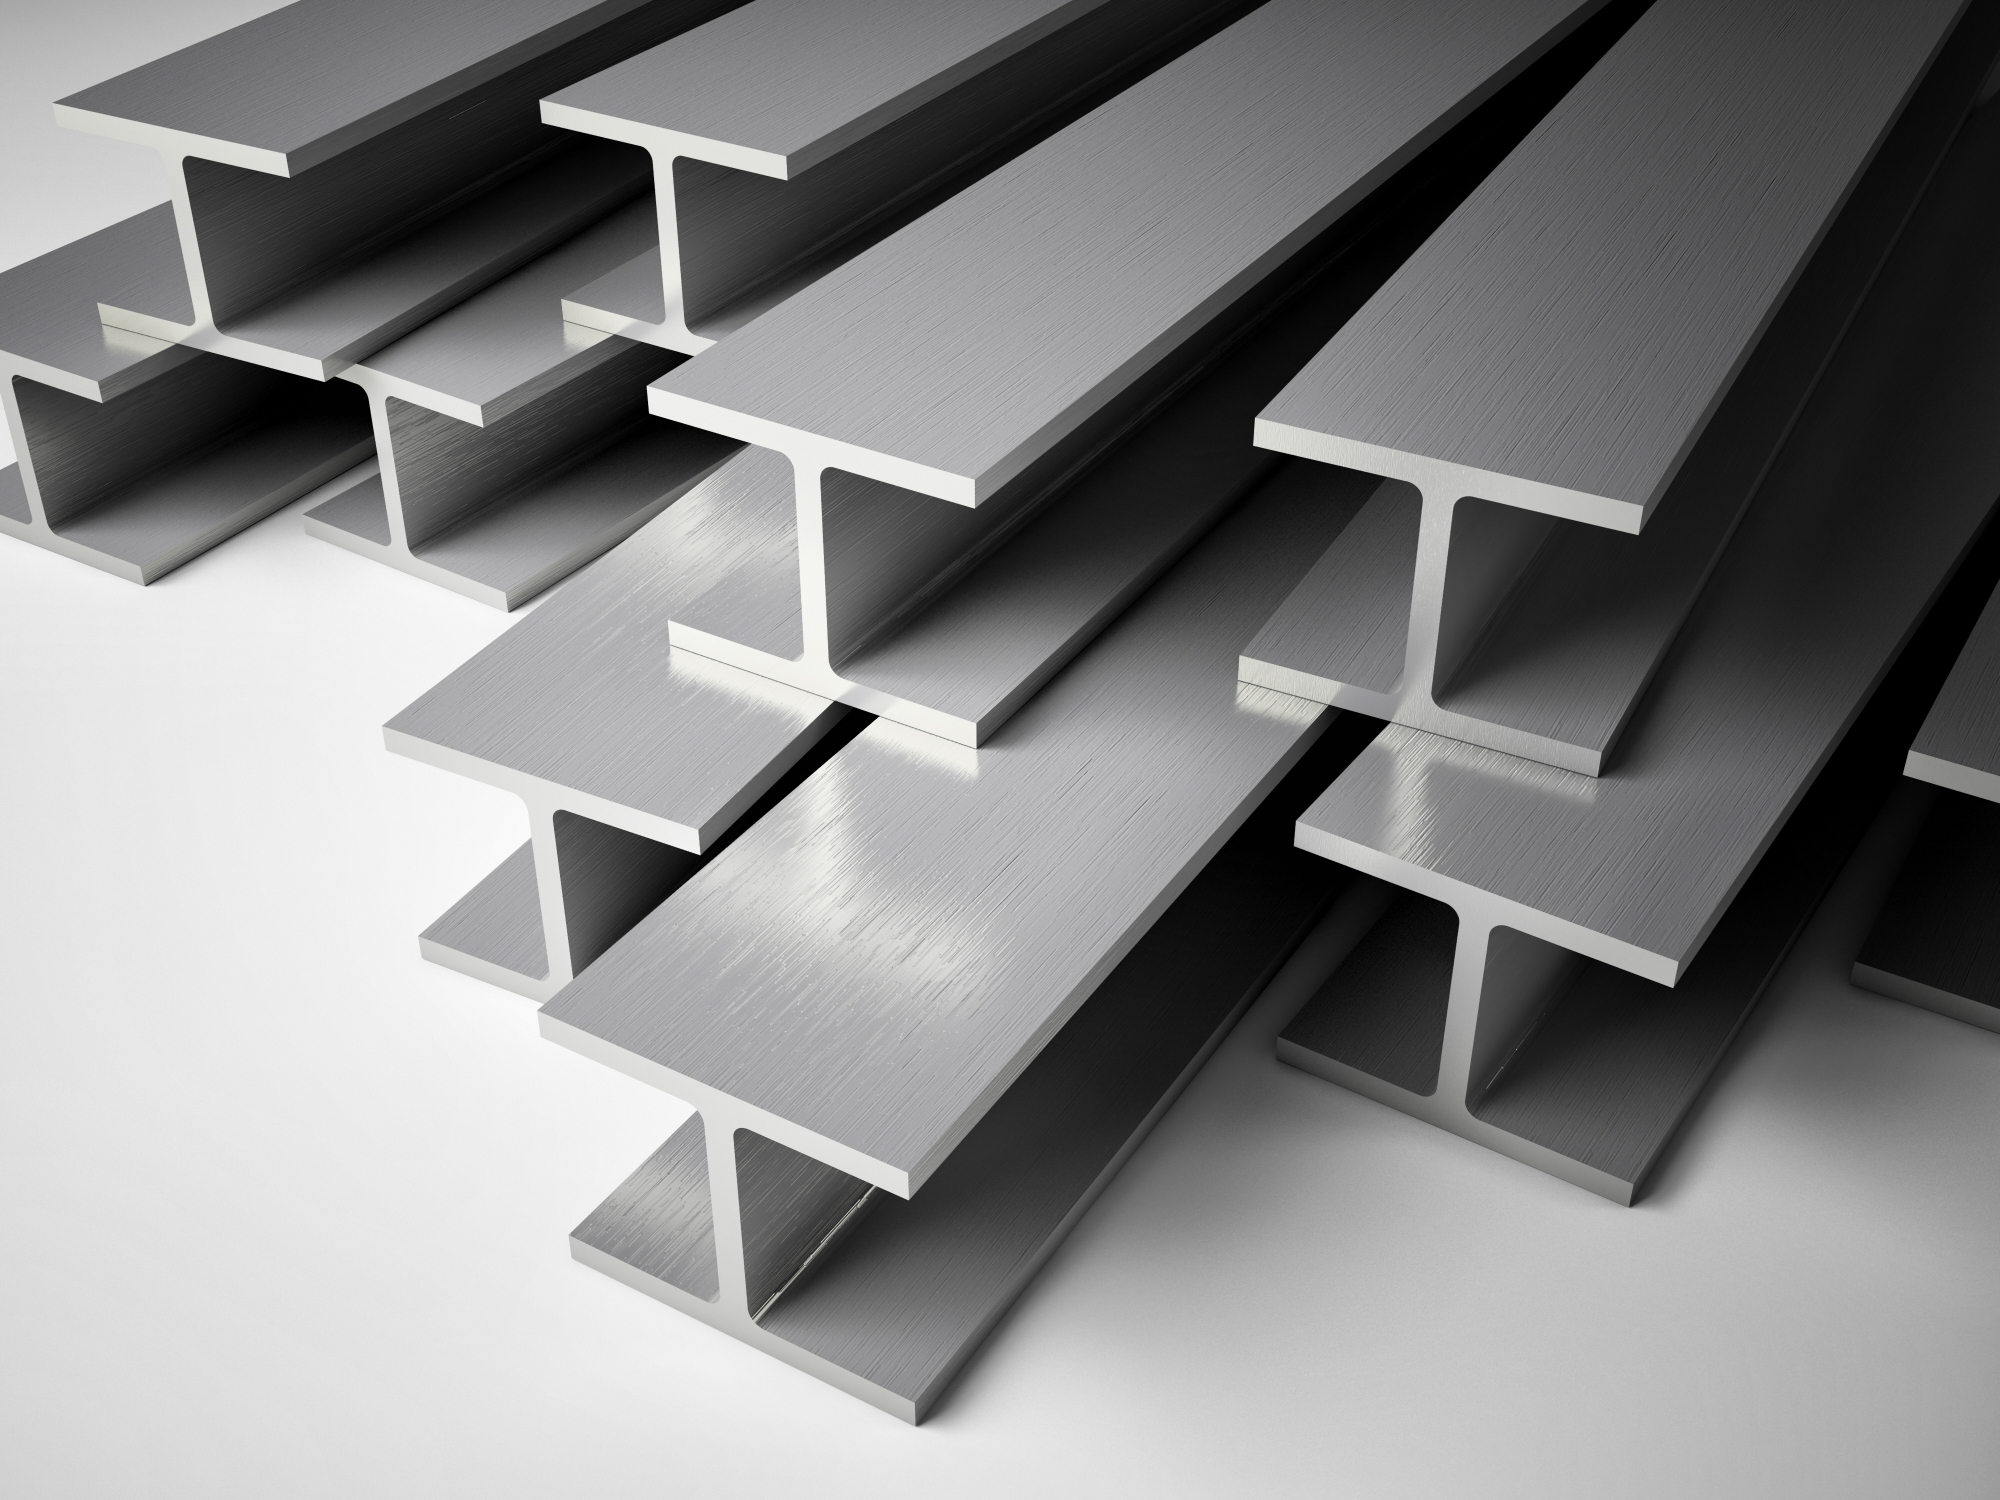 Steel-Beams-e1424098081368.jpg